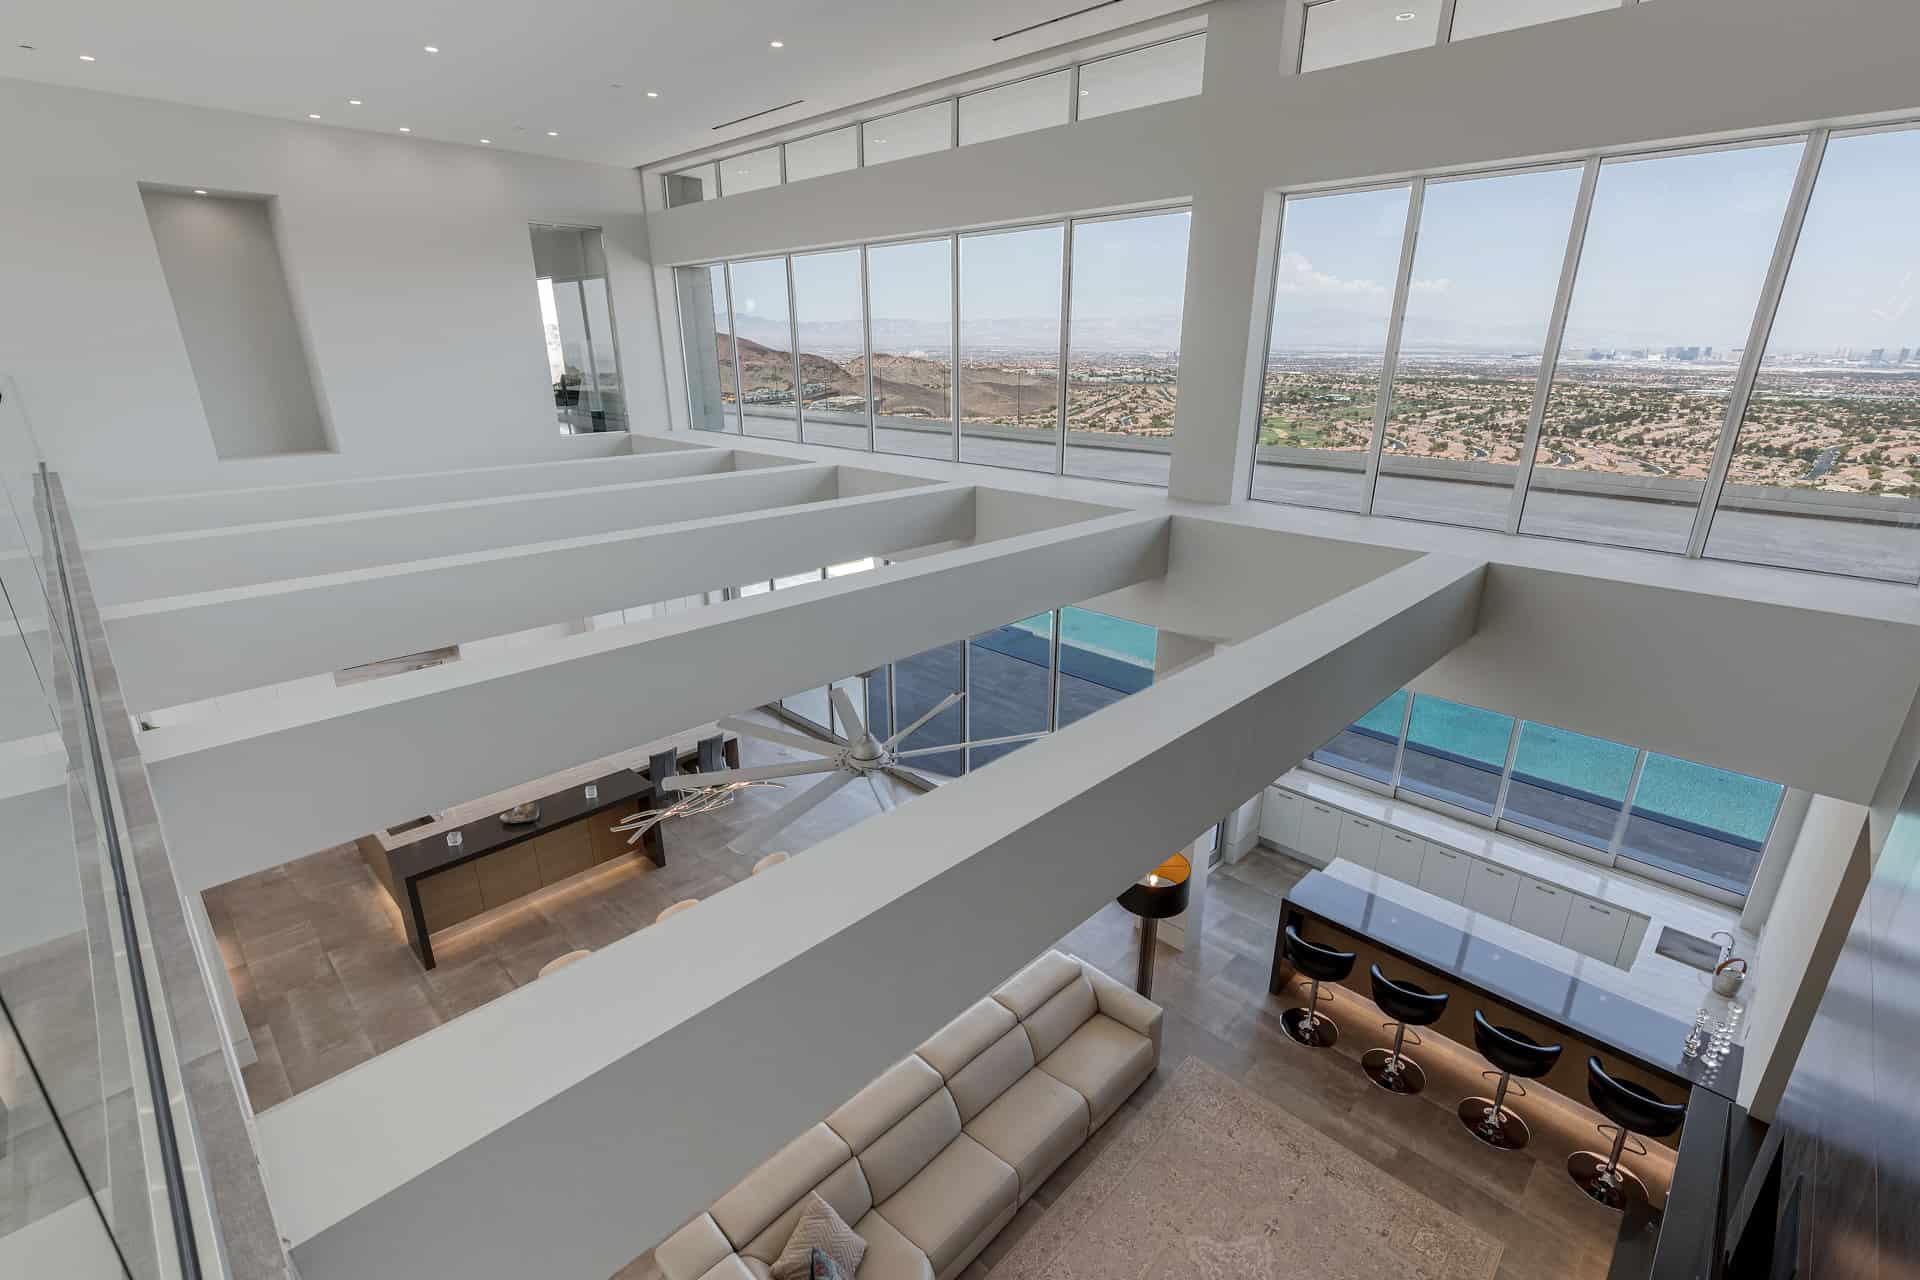 las-vegas-luxry-real-estate-realtor-rob-jensen-company-5-rockstream-drive-ascaya052